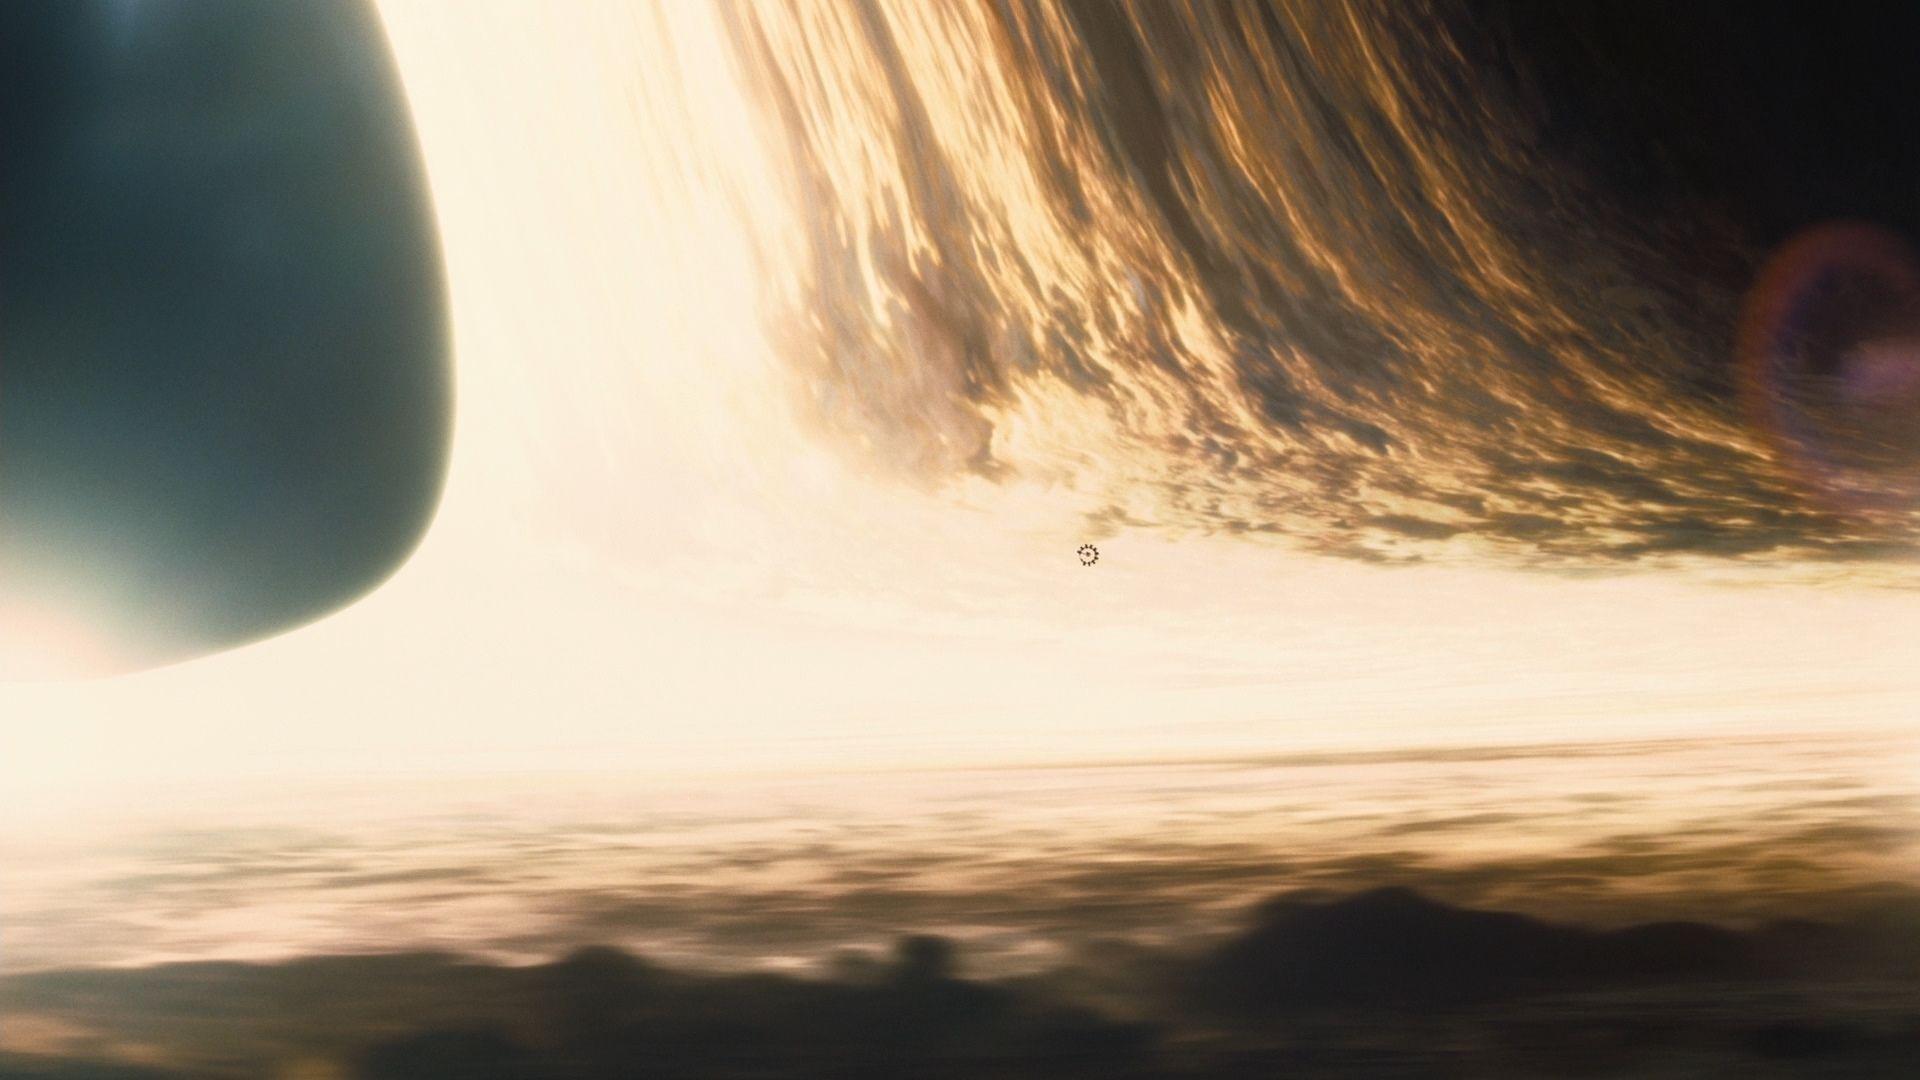 Black Hole Interstellar, Pic